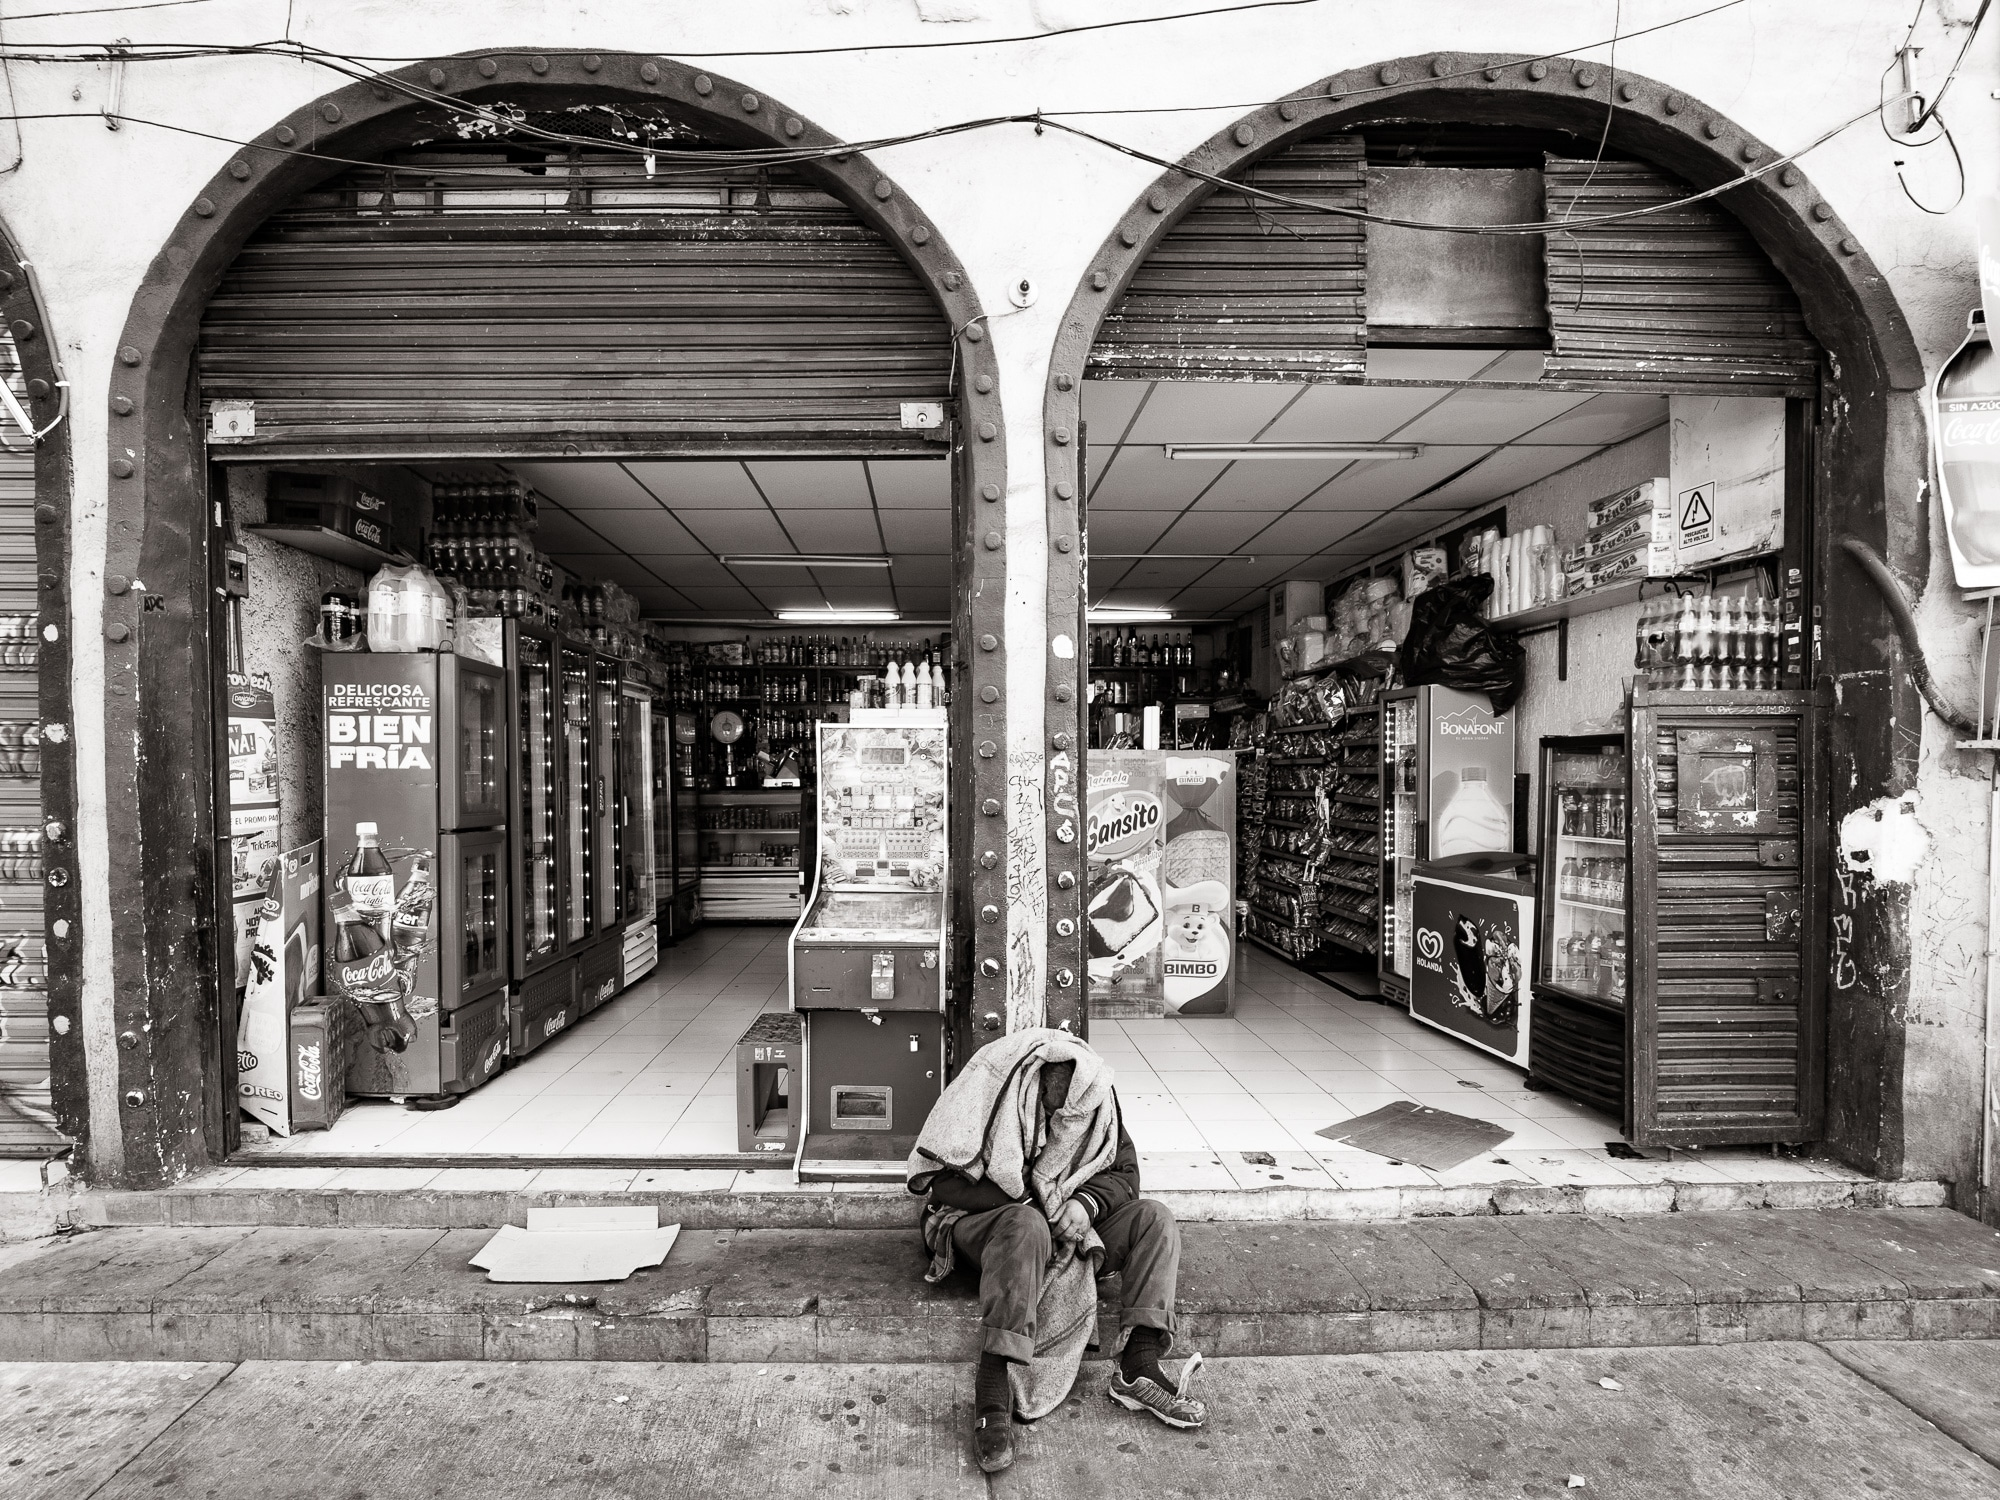 Hard life in Mexico city